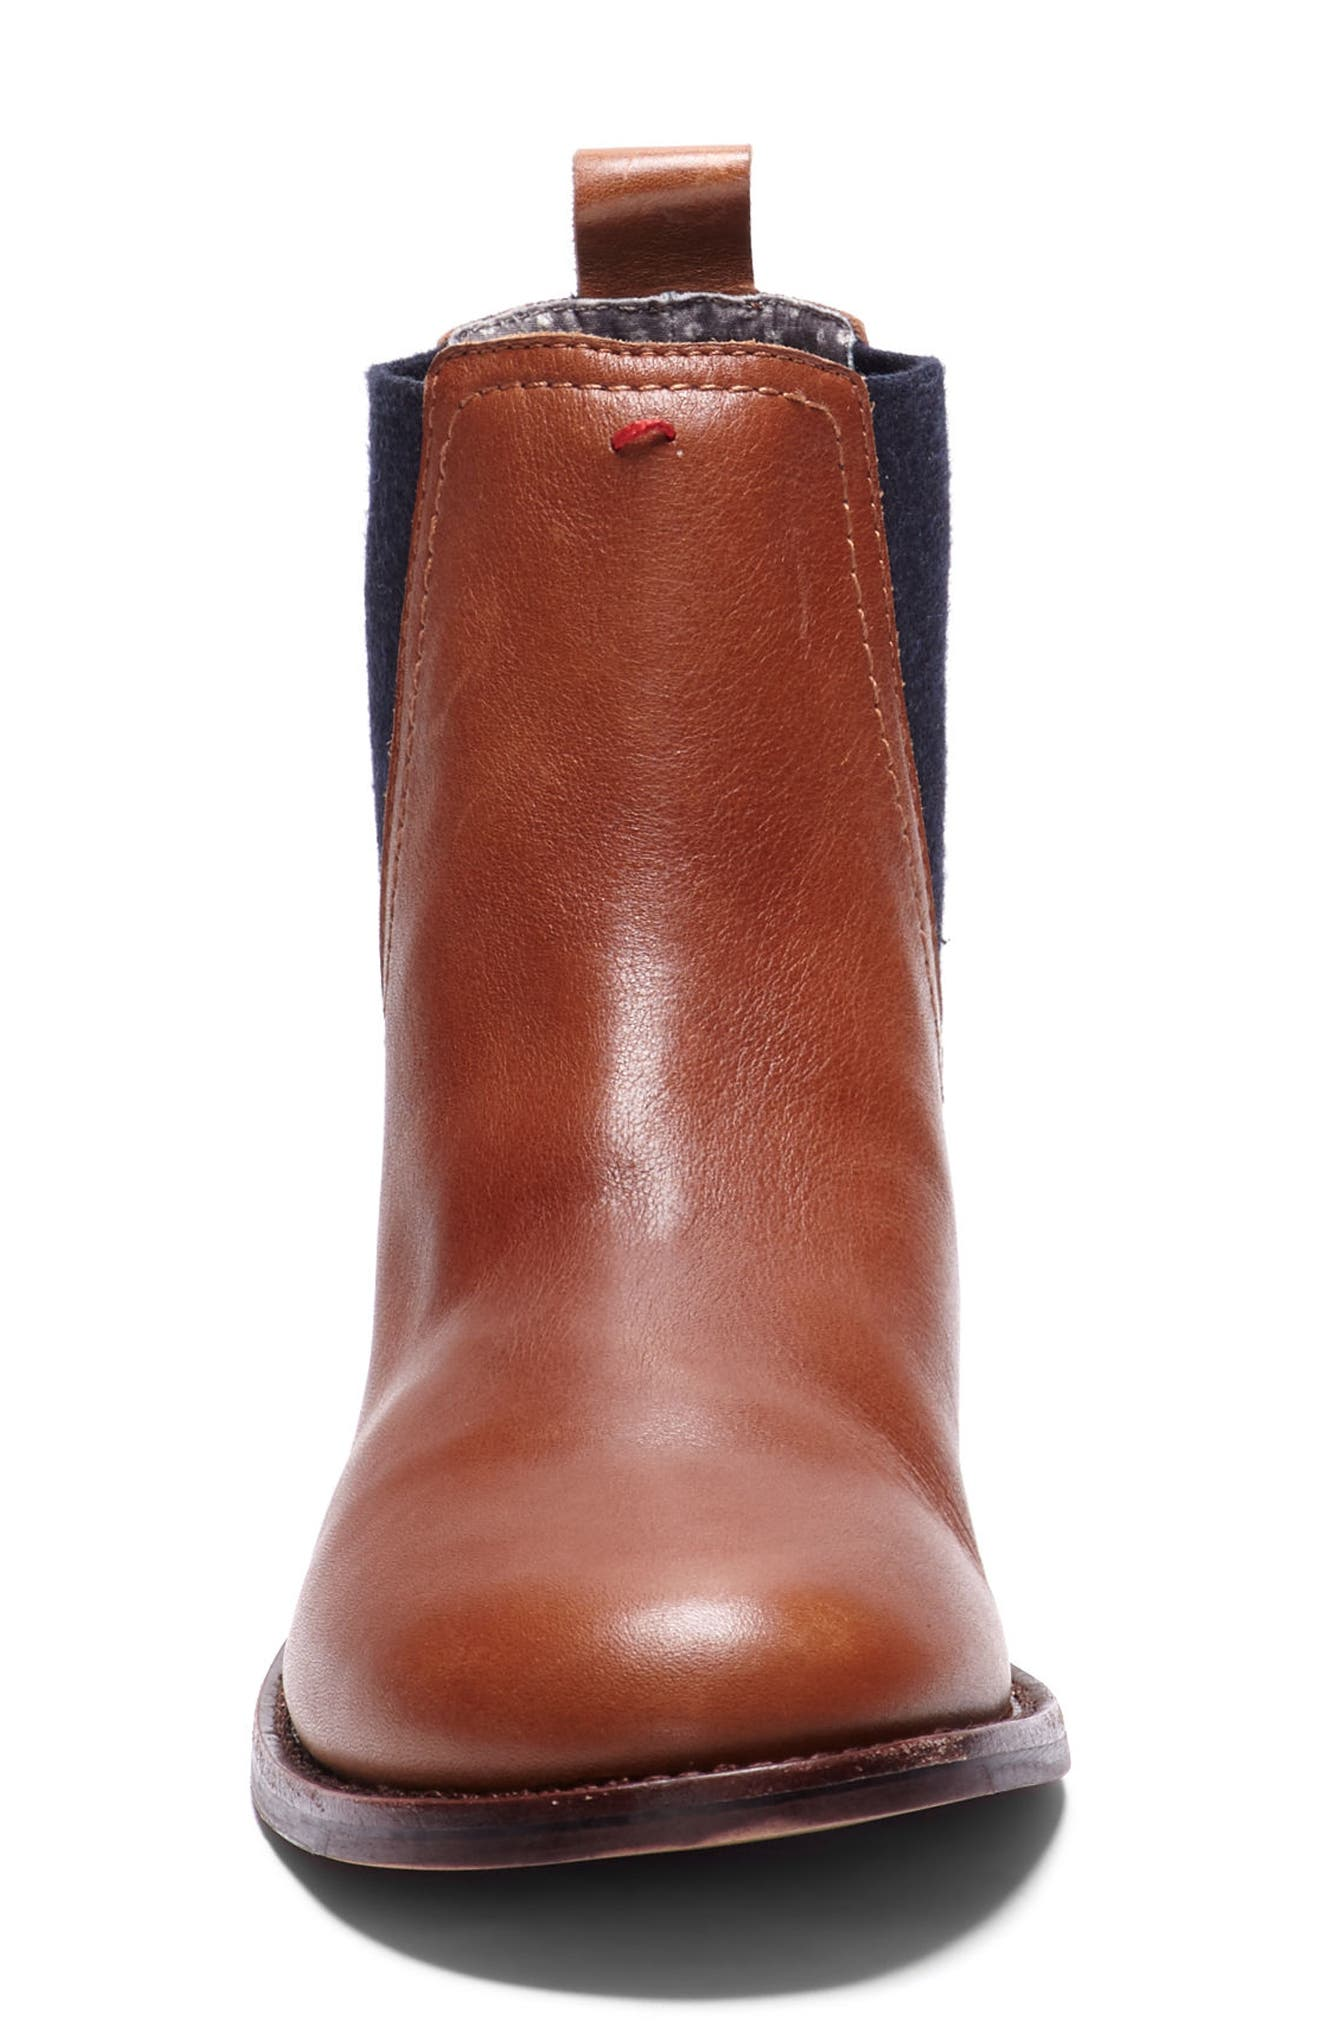 Zabi Chelsea Boot,                             Alternate thumbnail 3, color,                             Yam Leather